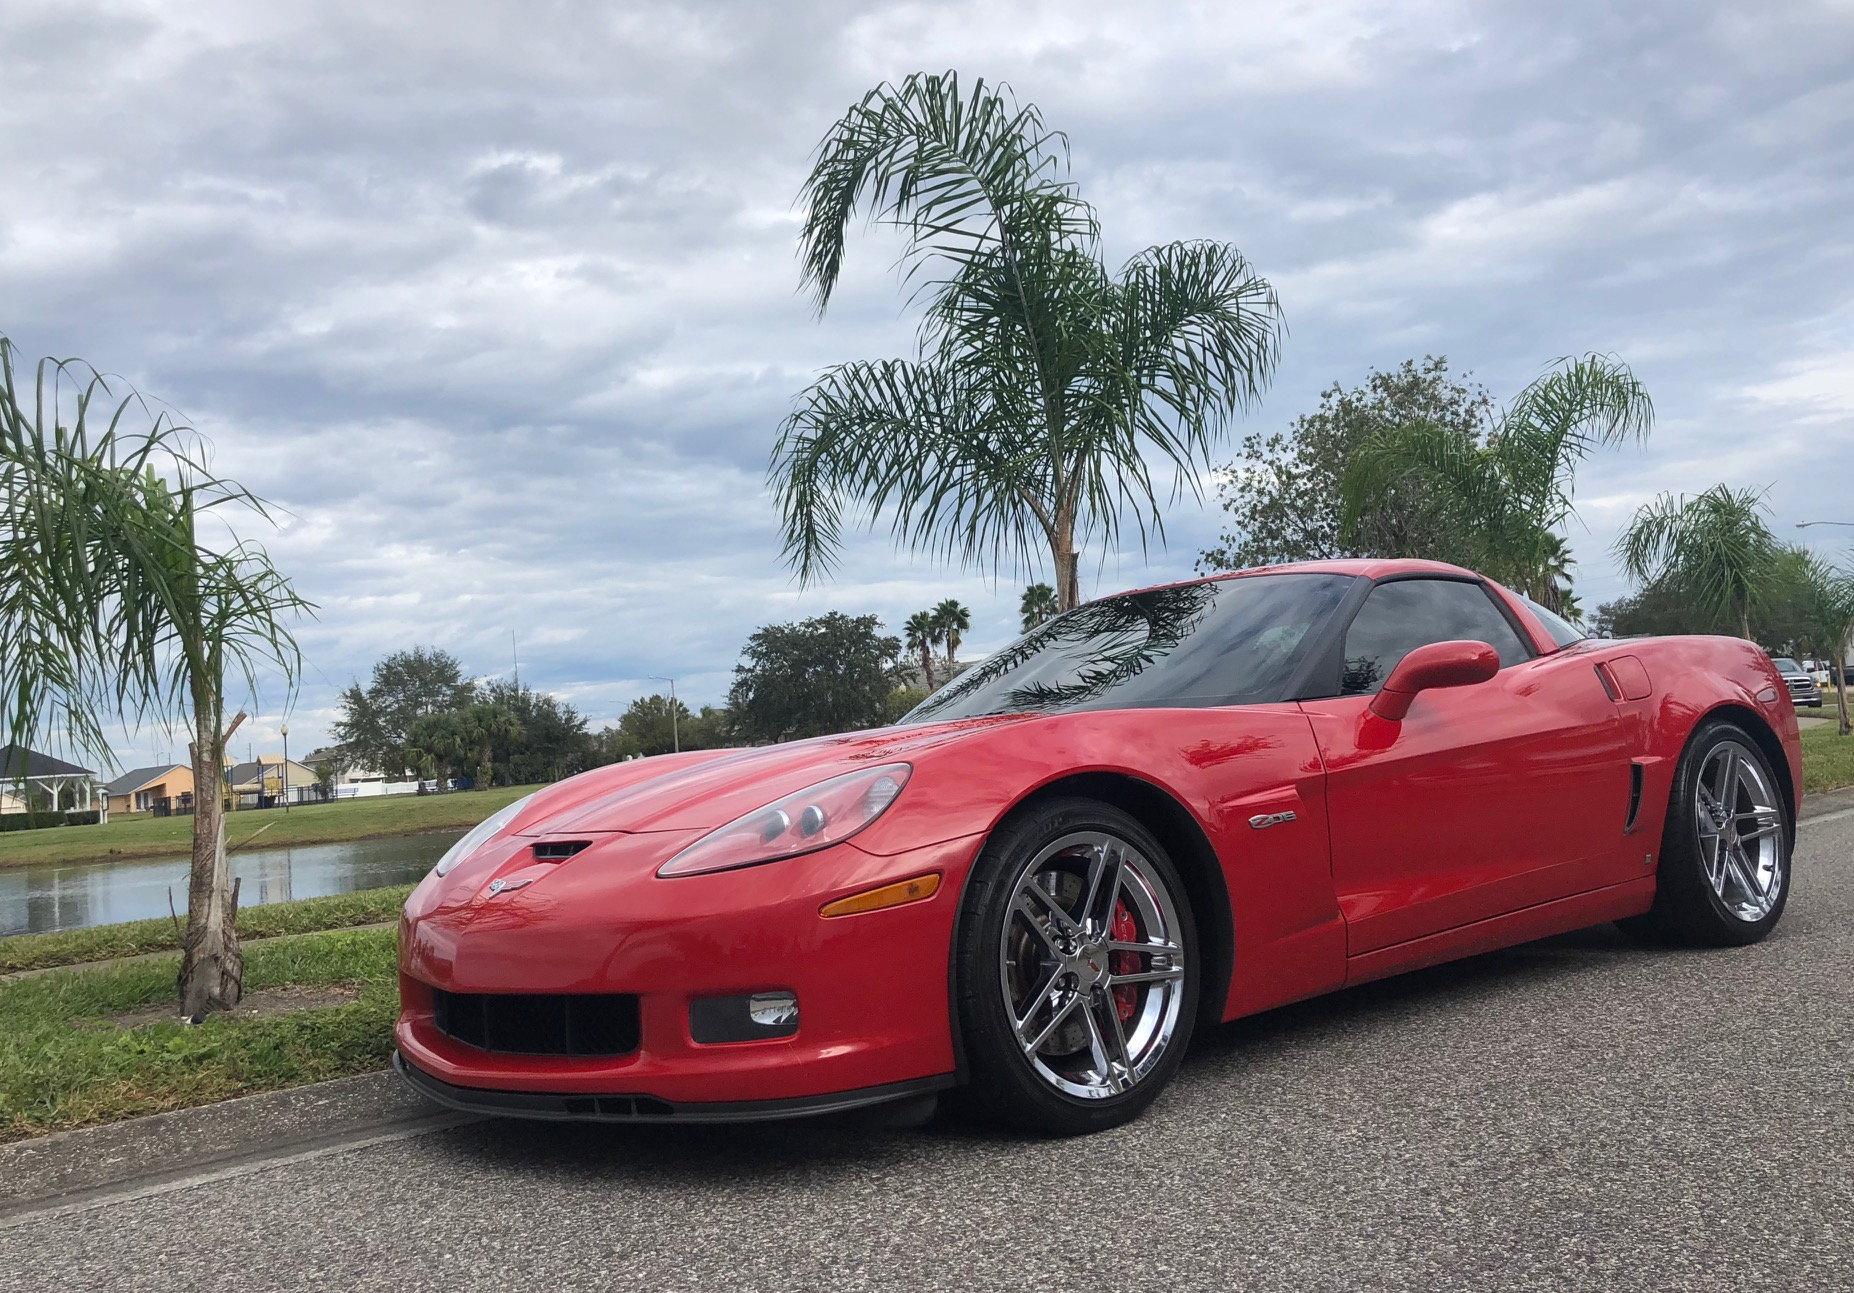 Corvette For Sale Near Me >> FS (For Sale) 2008 Victory Red Corvette C6 Z06 2LZ *STOCK ...